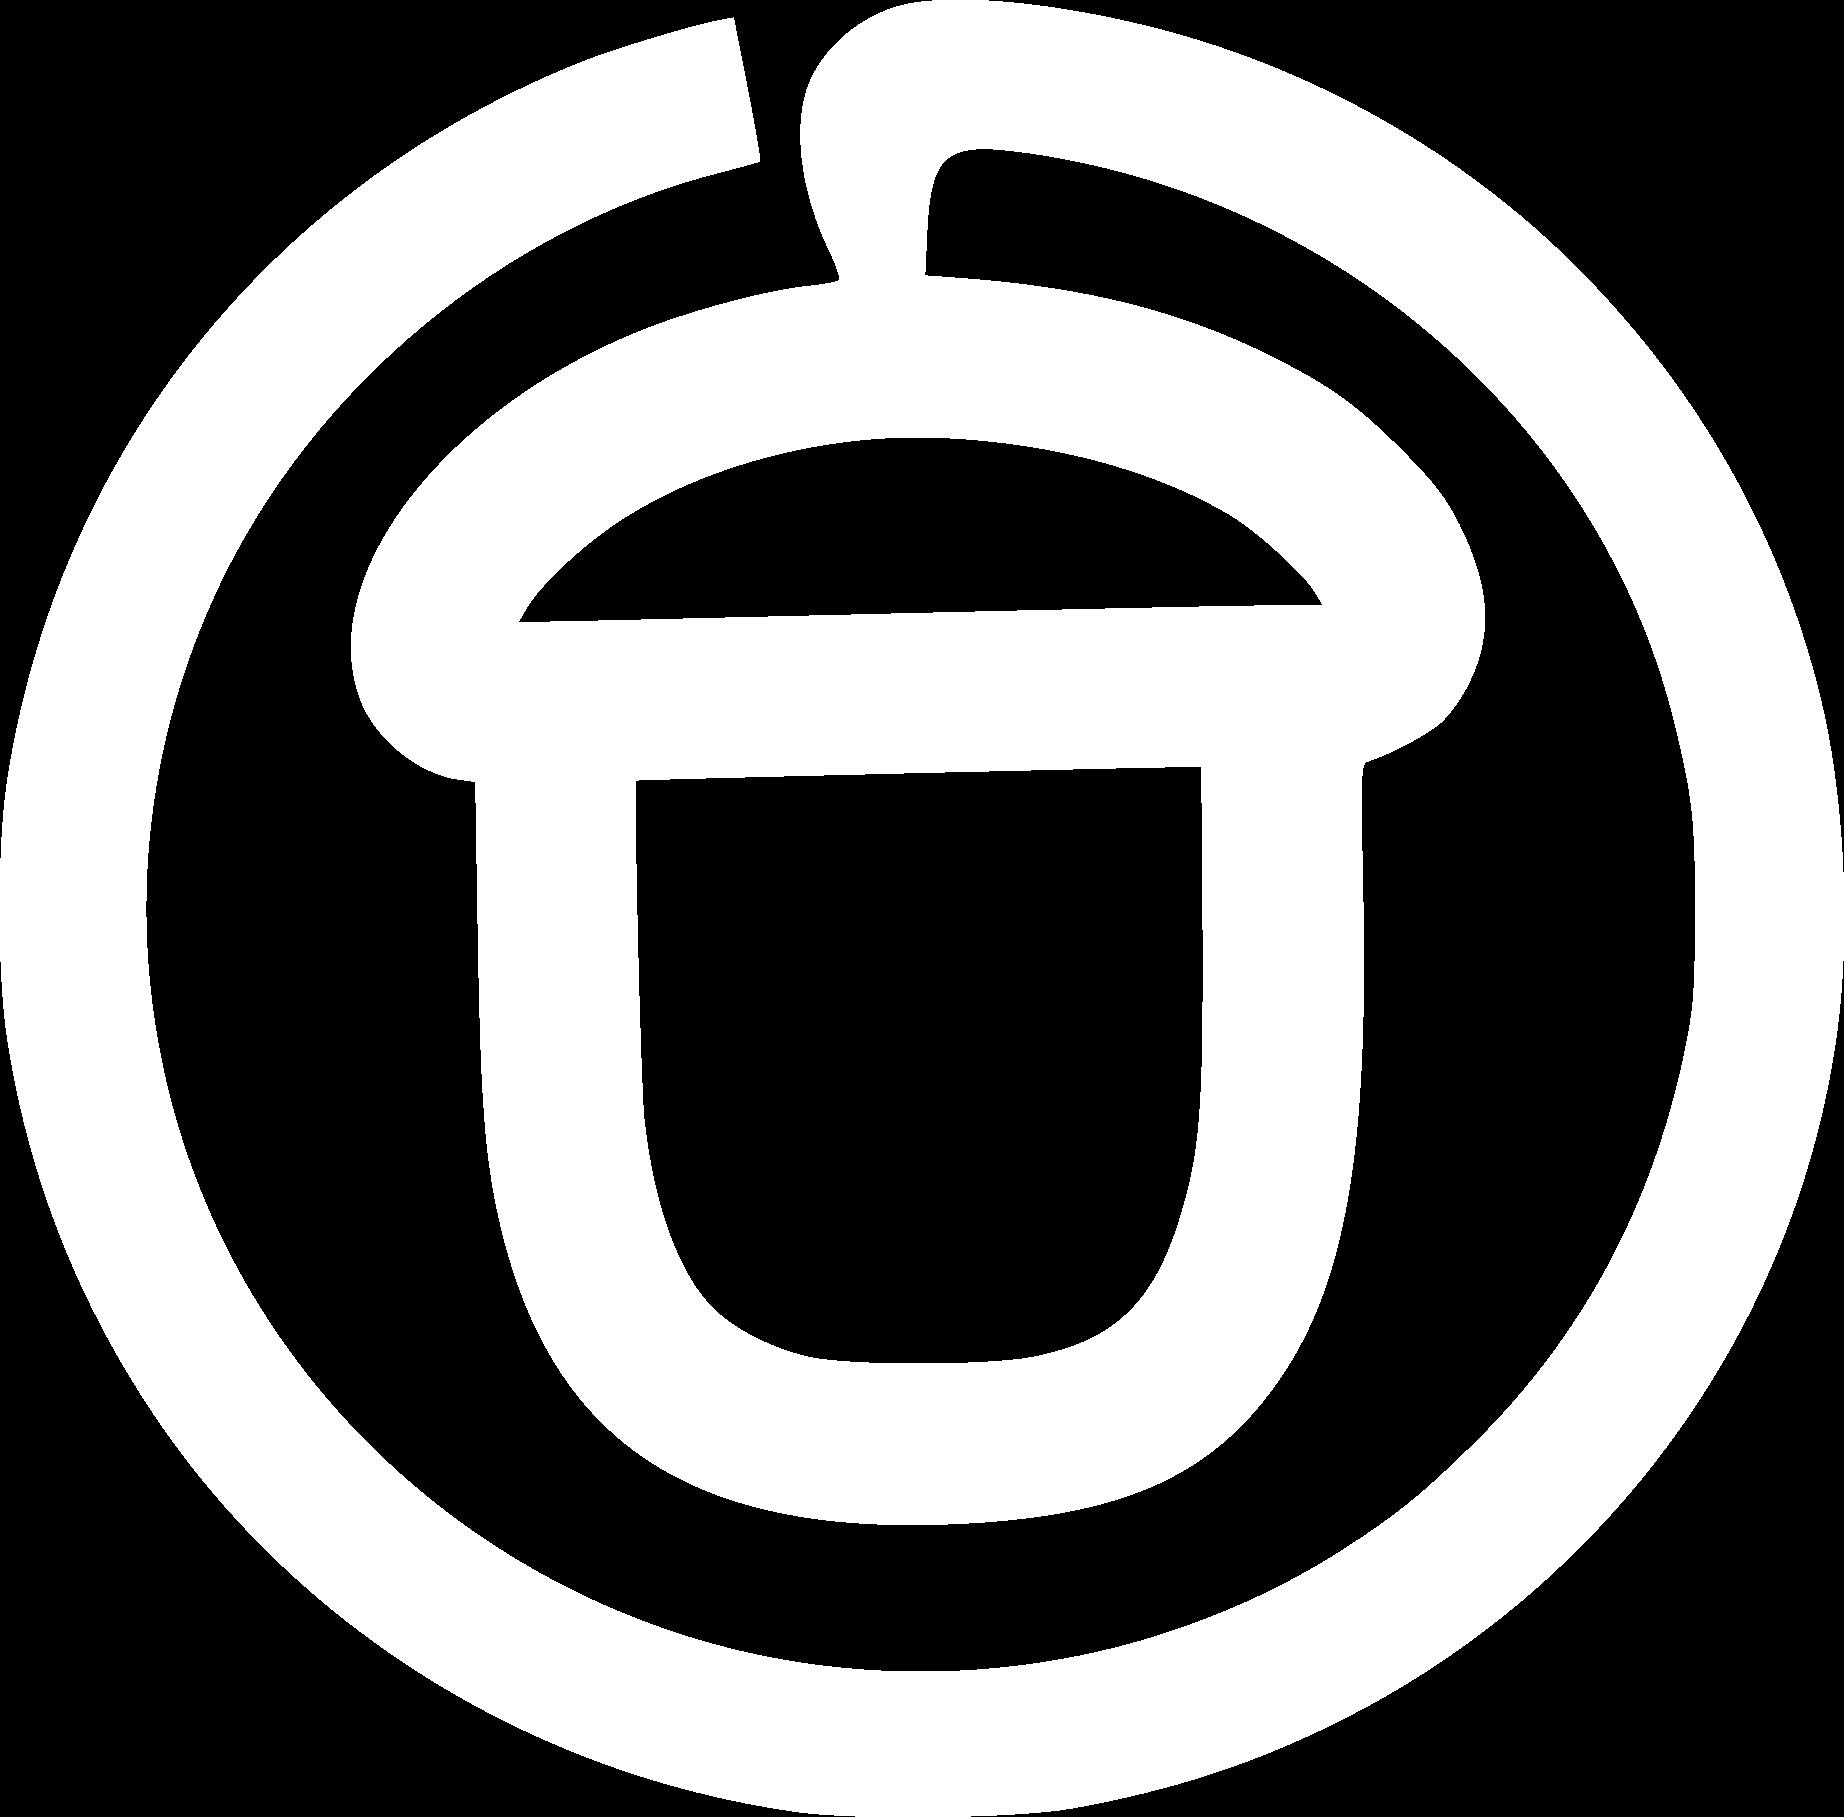 ACORN The Union